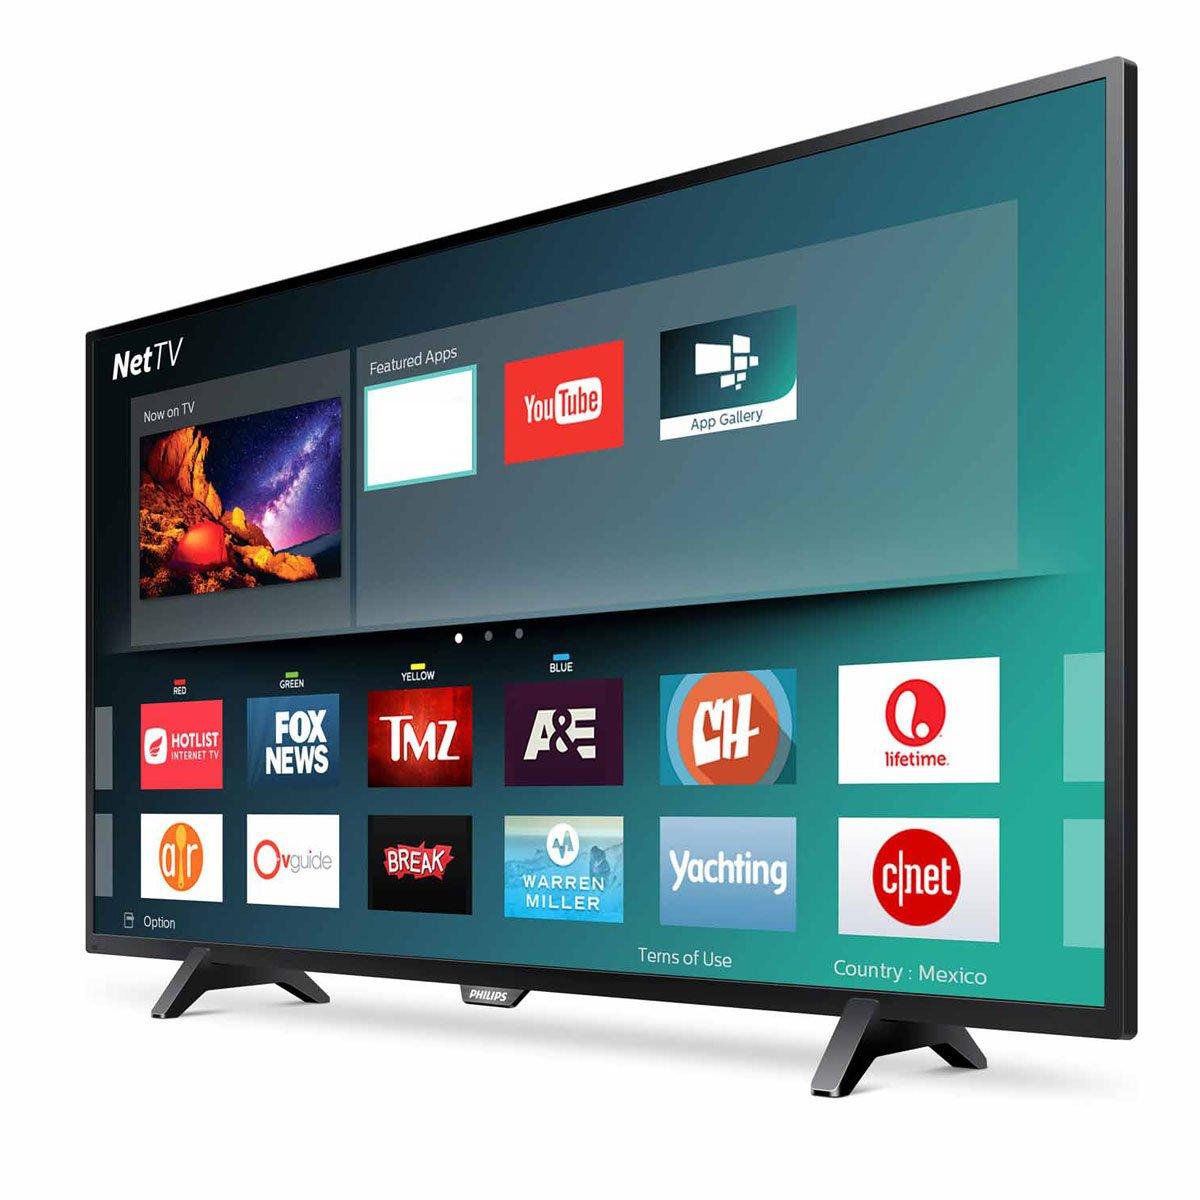 Manual For 58inch Hisense 4k Tv